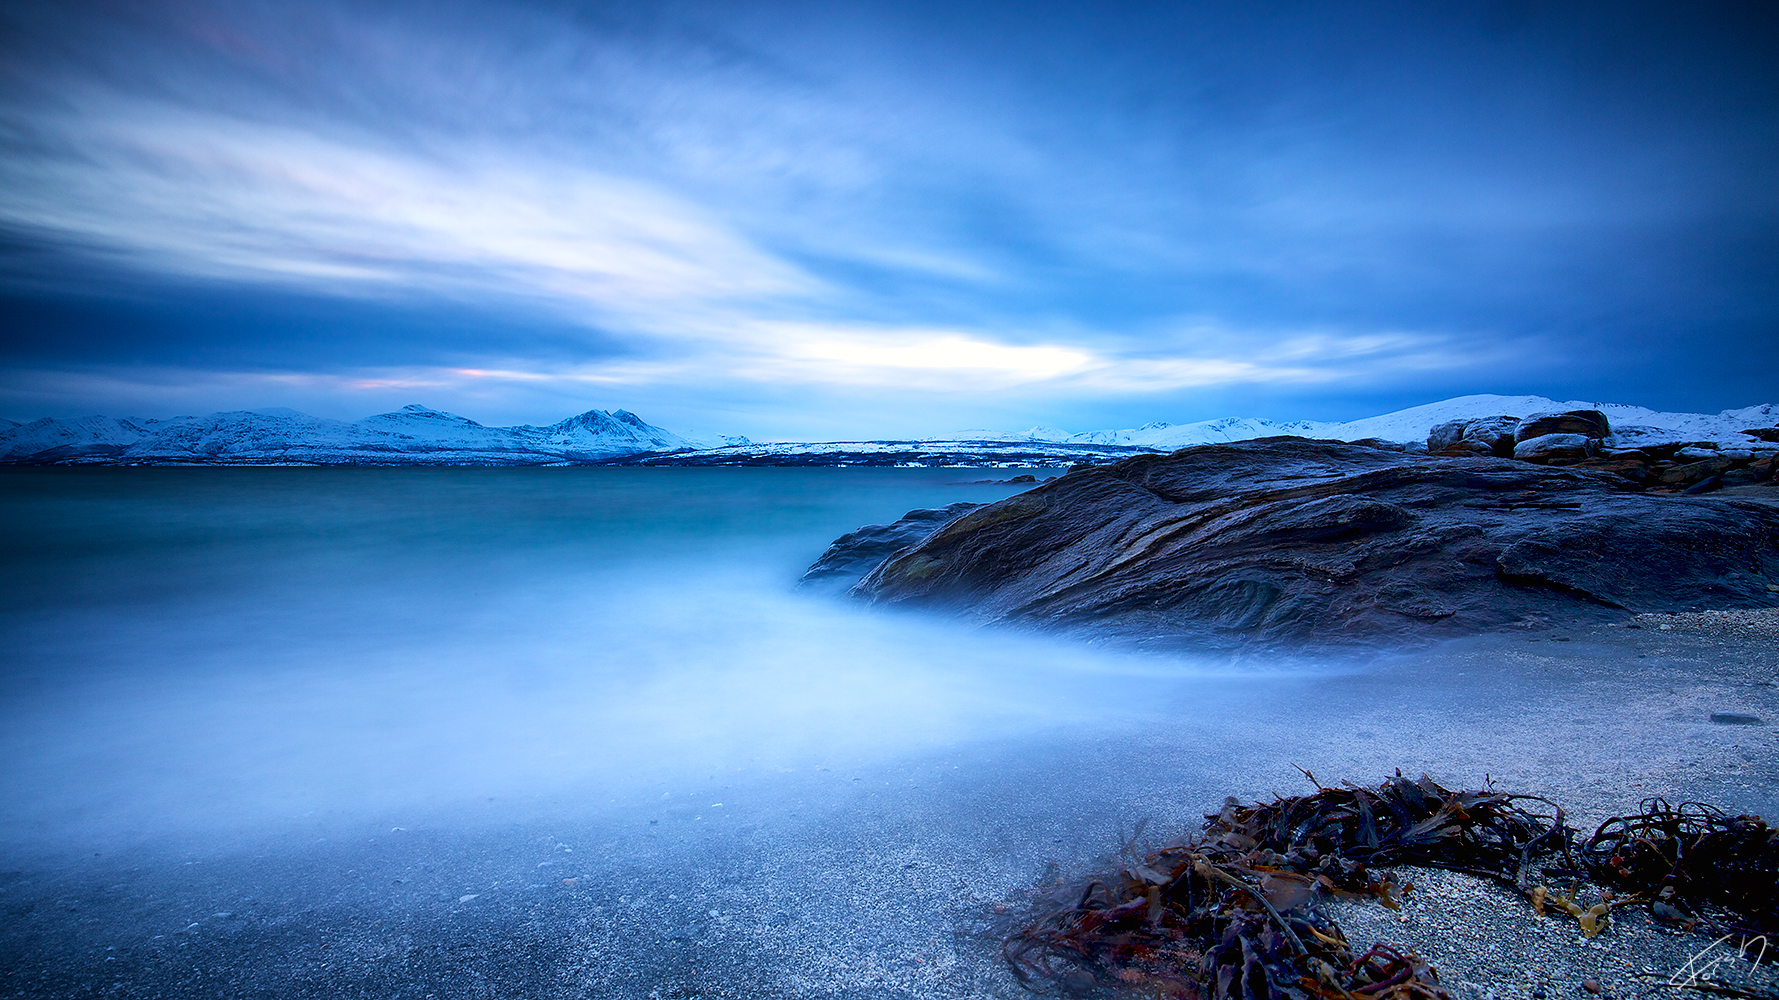 Vinterlys / Winter blues